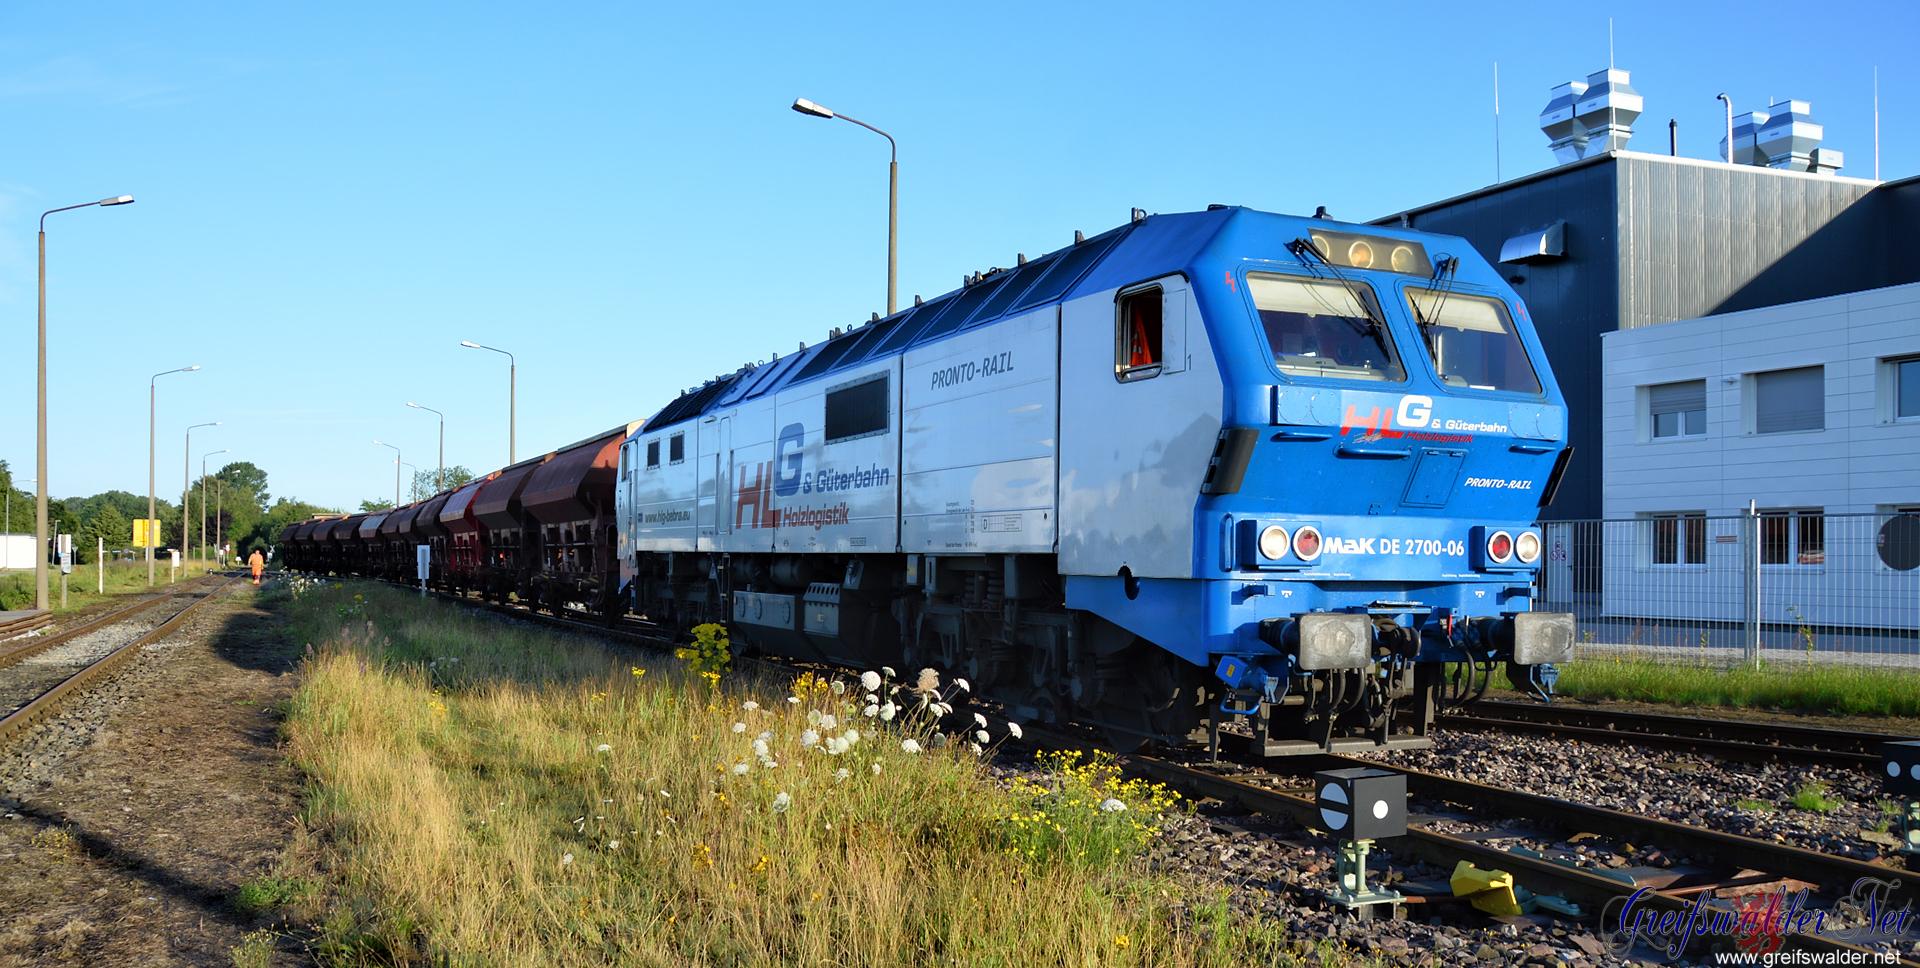 Güterzug in Greifswald-Ladebow